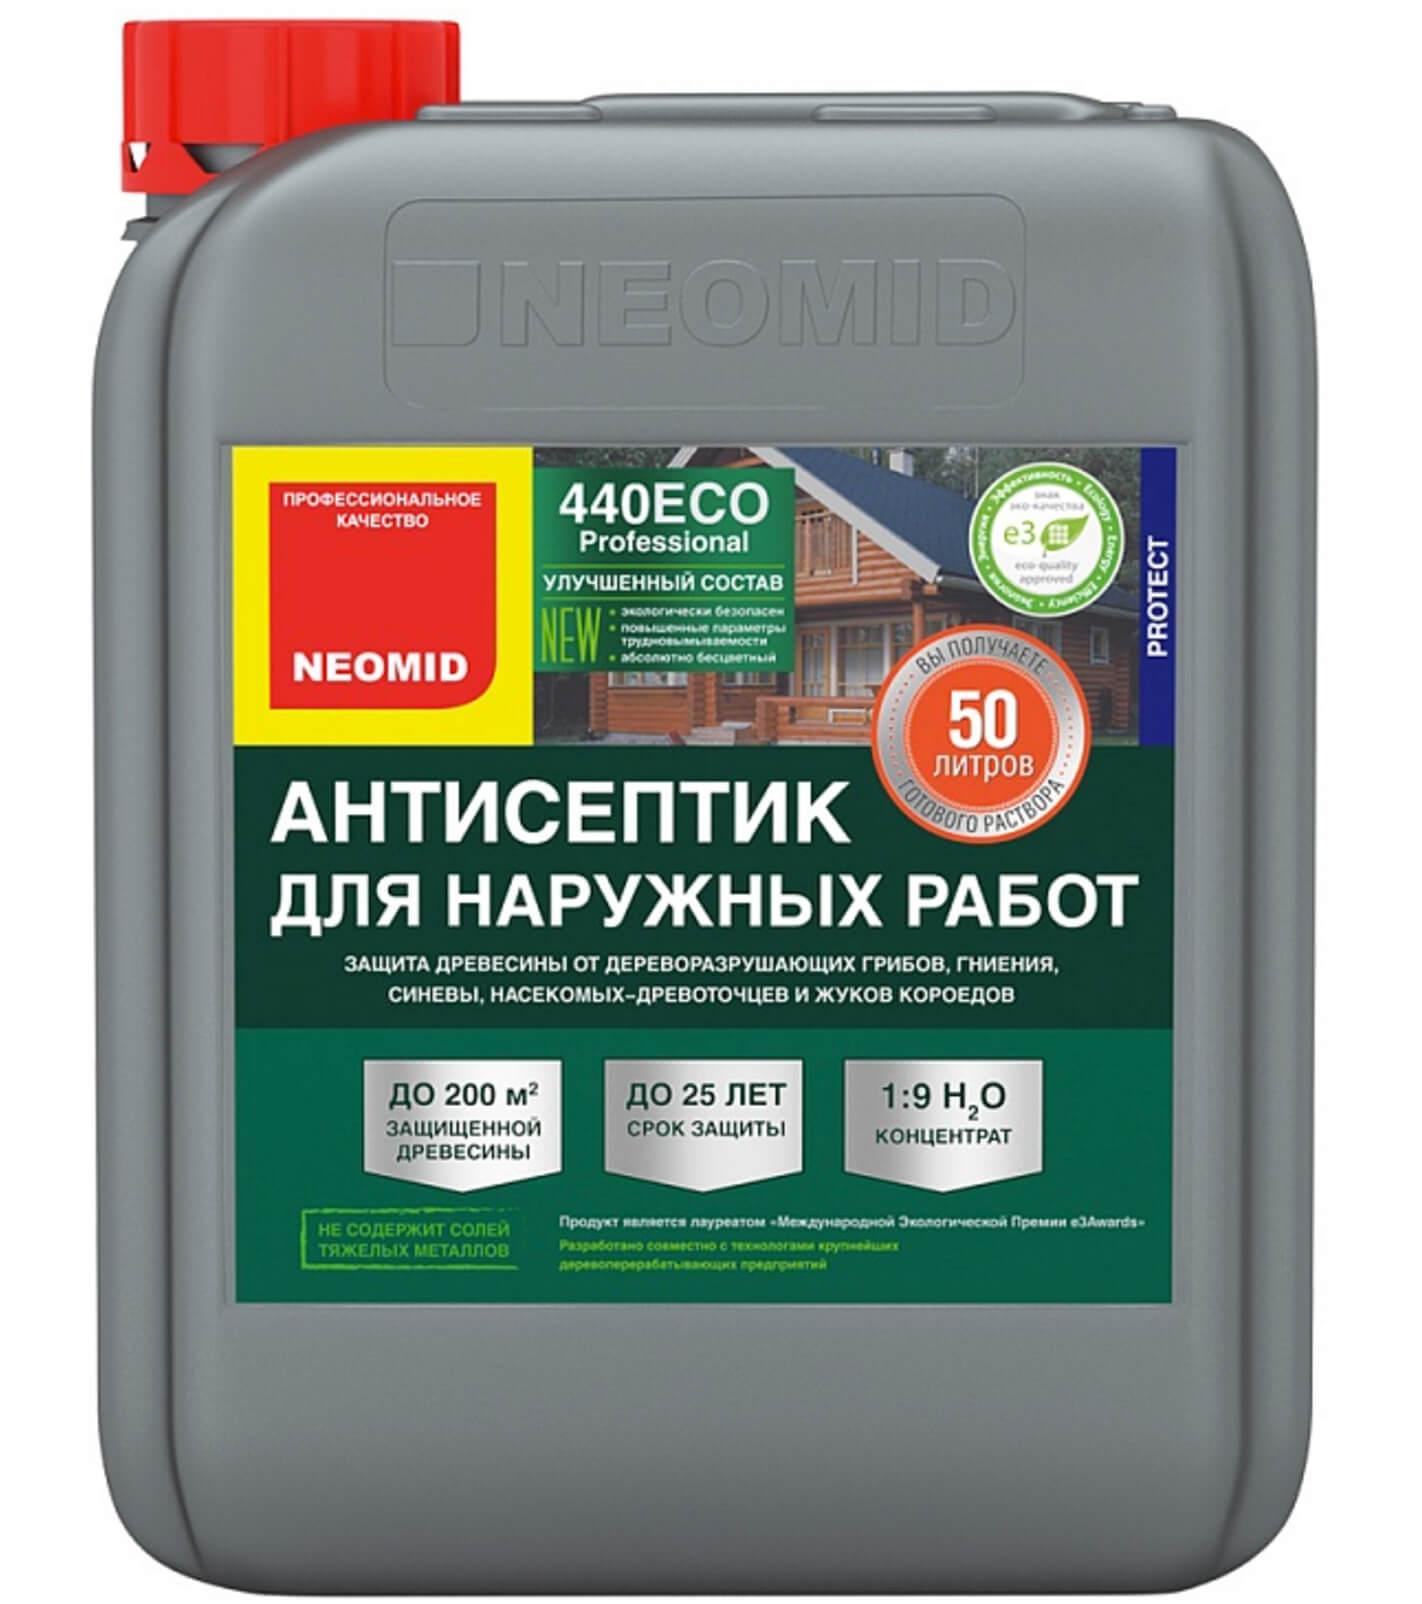 Neomid 440 ECO : Neomid 440 EKO antiseptik bestsvetnyy